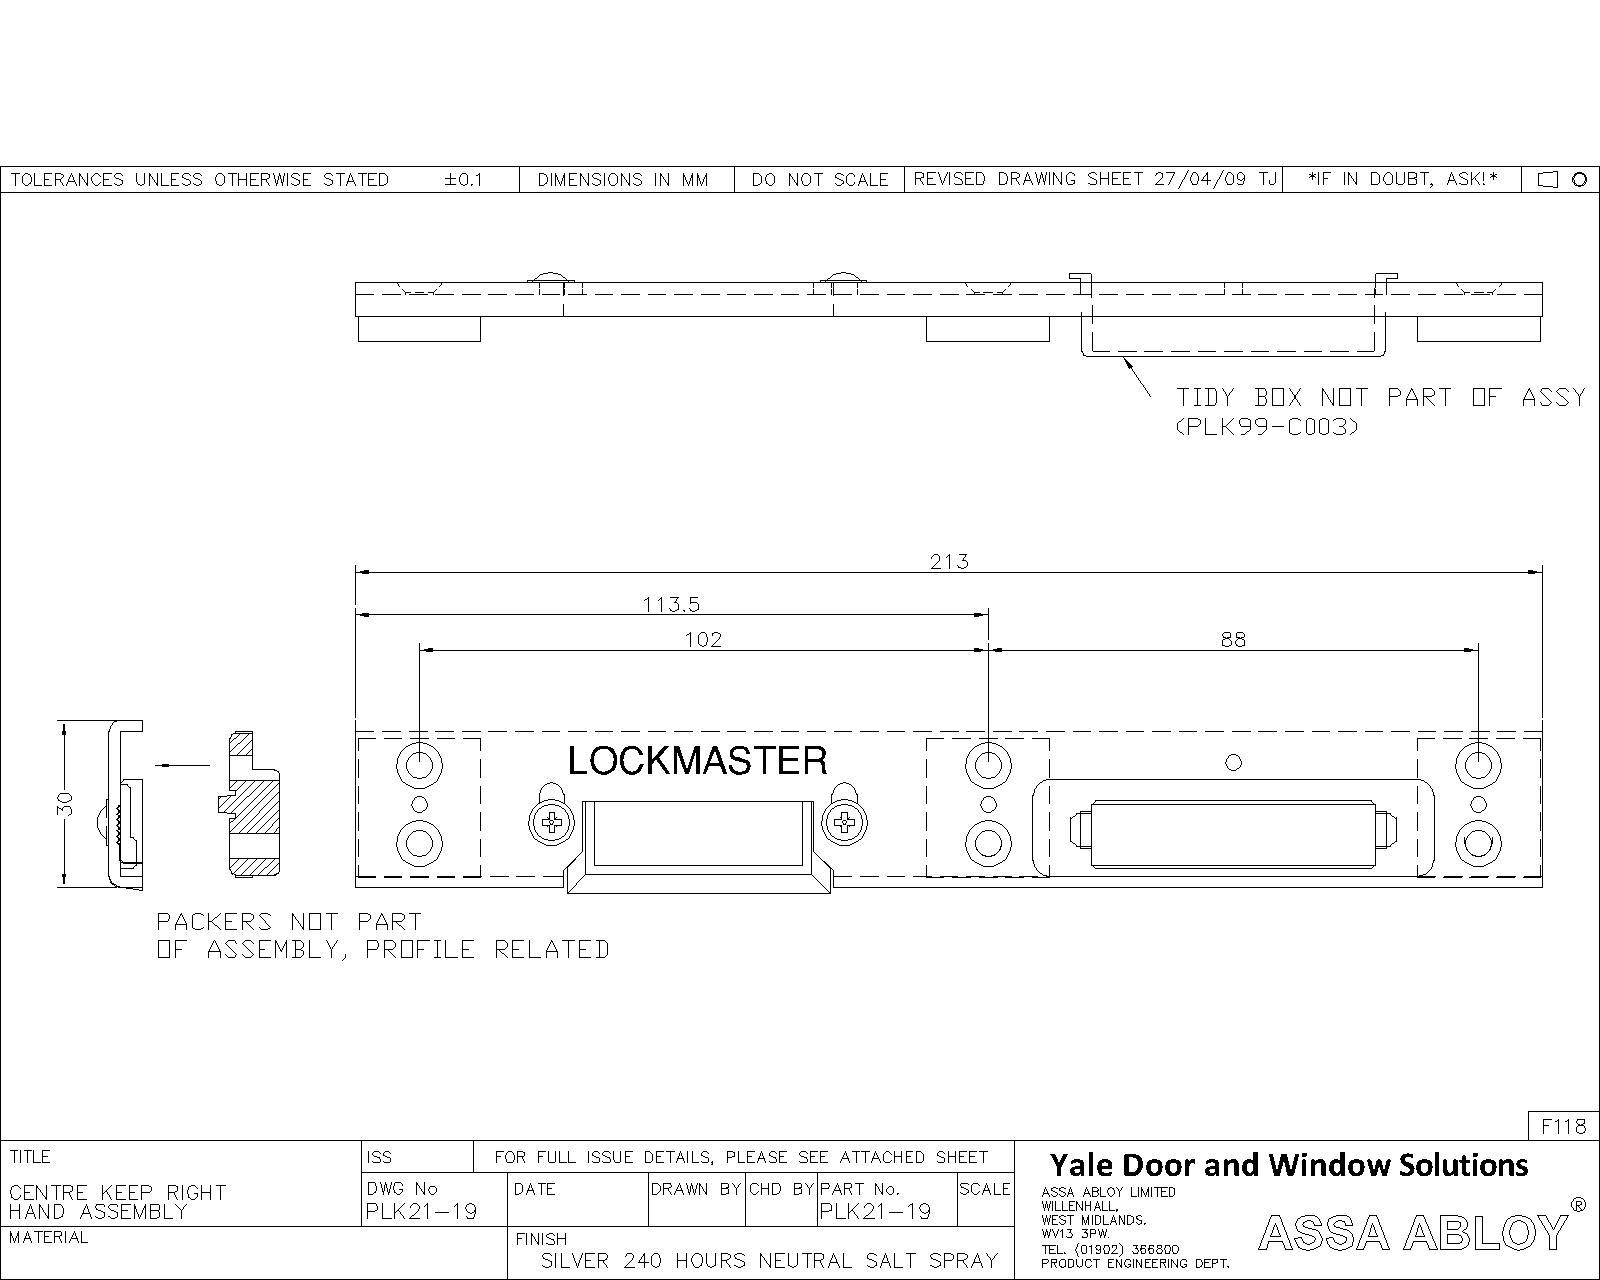 Lockmaster Upvc Centre Keep Right Hand PLK21-19